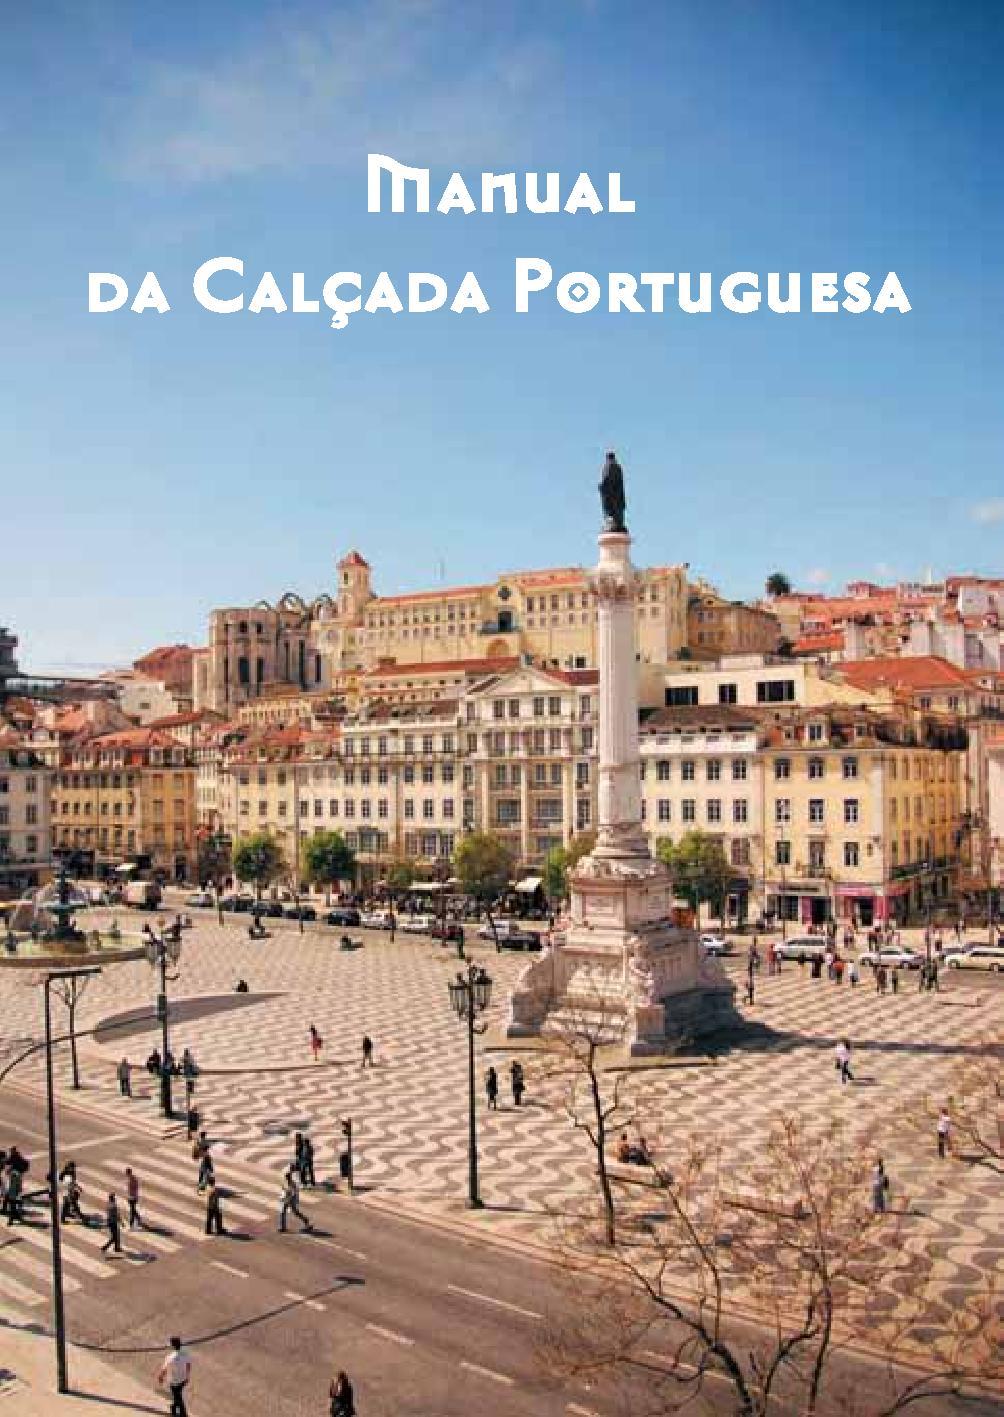 Manual da Calçada Portuguesa (DG Energia/2009)